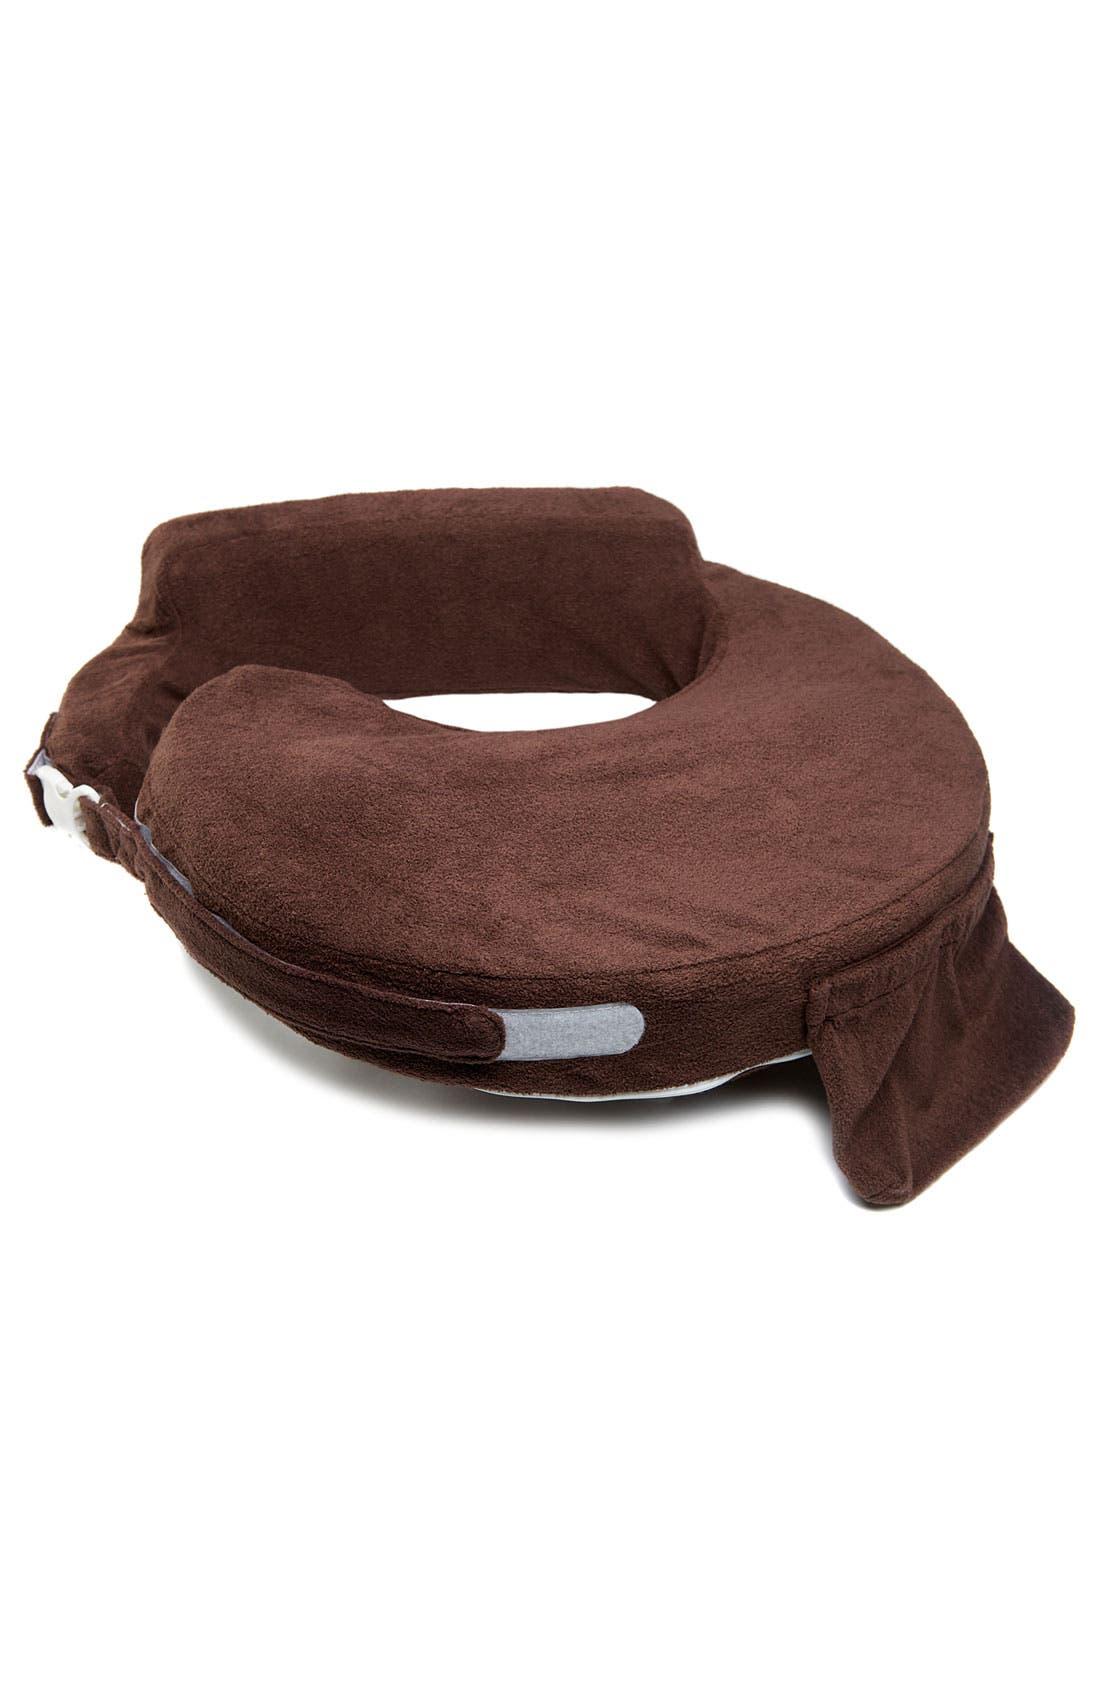 Alternate Image 1 Selected - My Brest Friend Nursing Pillow